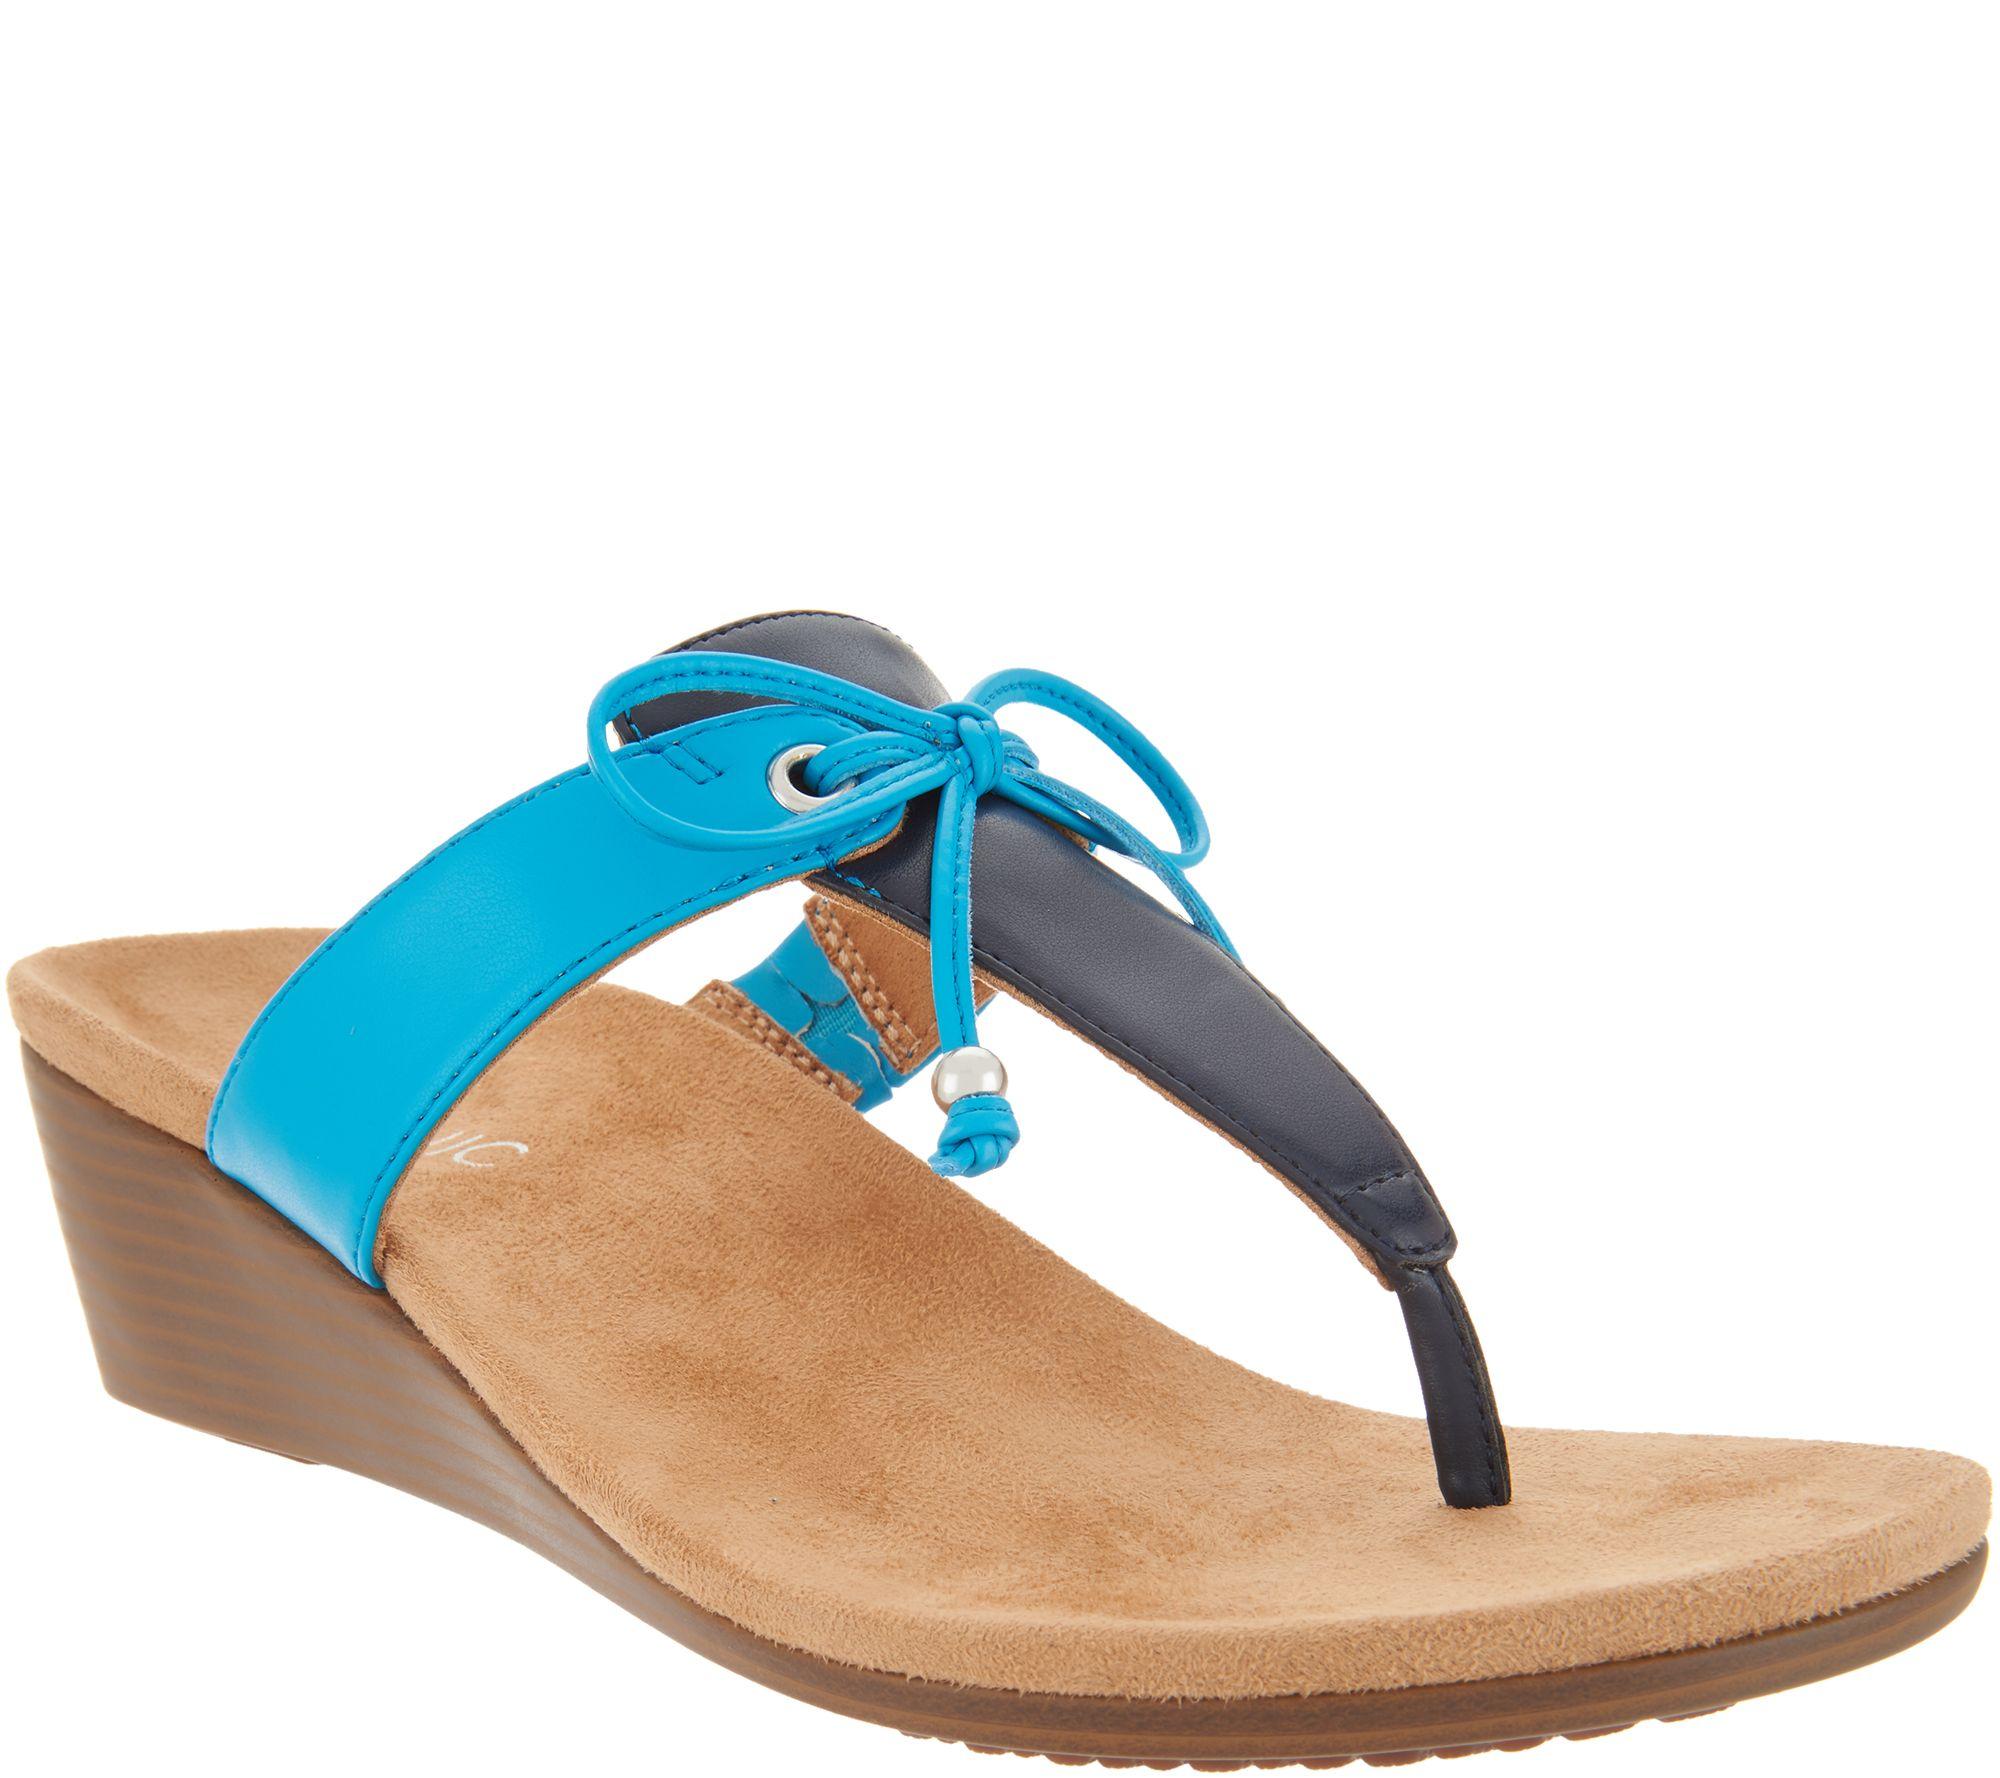 ab772db9fe15 Vionic Bow T-Strap Wedge Sandals - Della - Page 1 — QVC.com